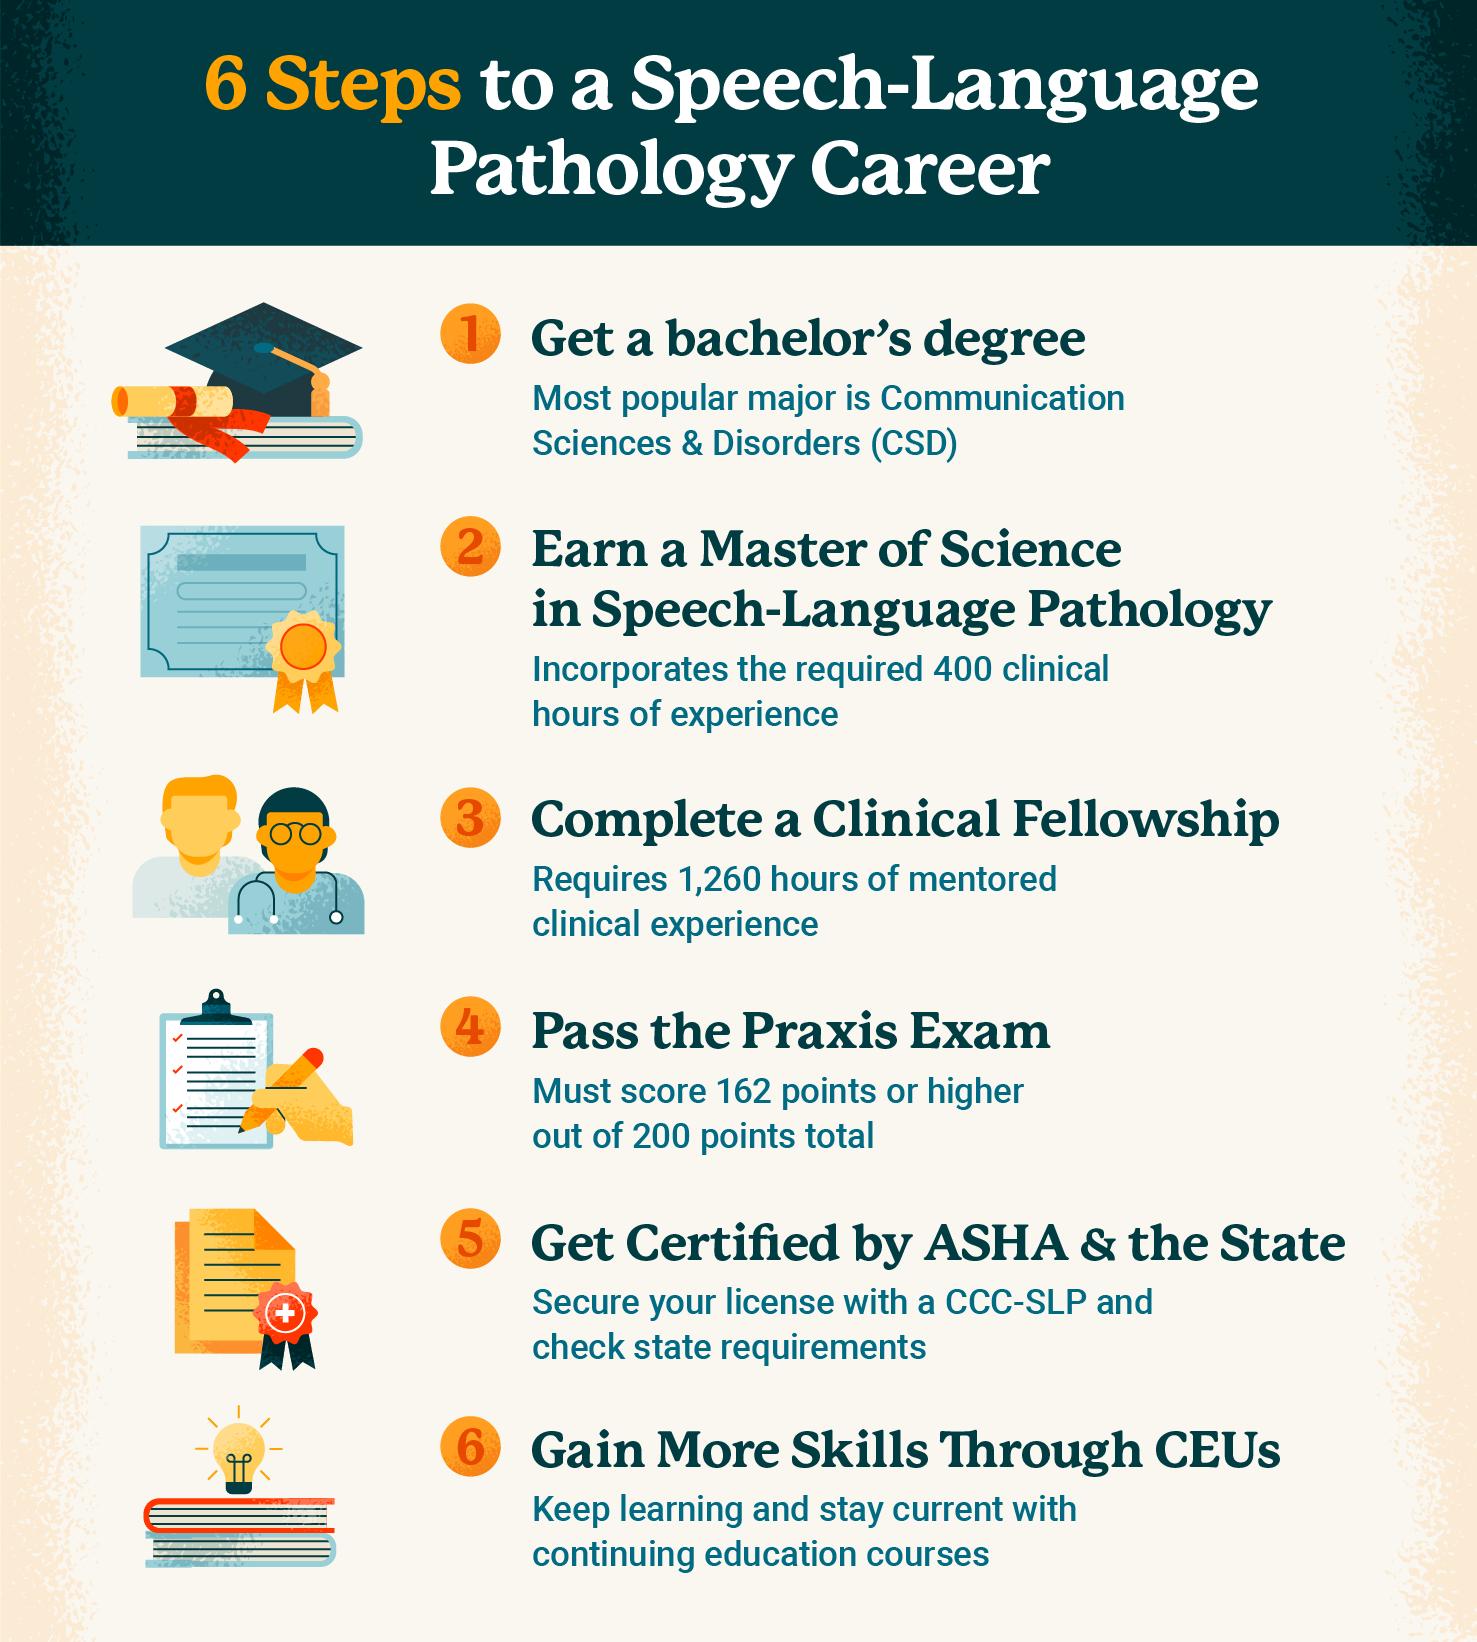 6 steps to a speech language pathology career graphic